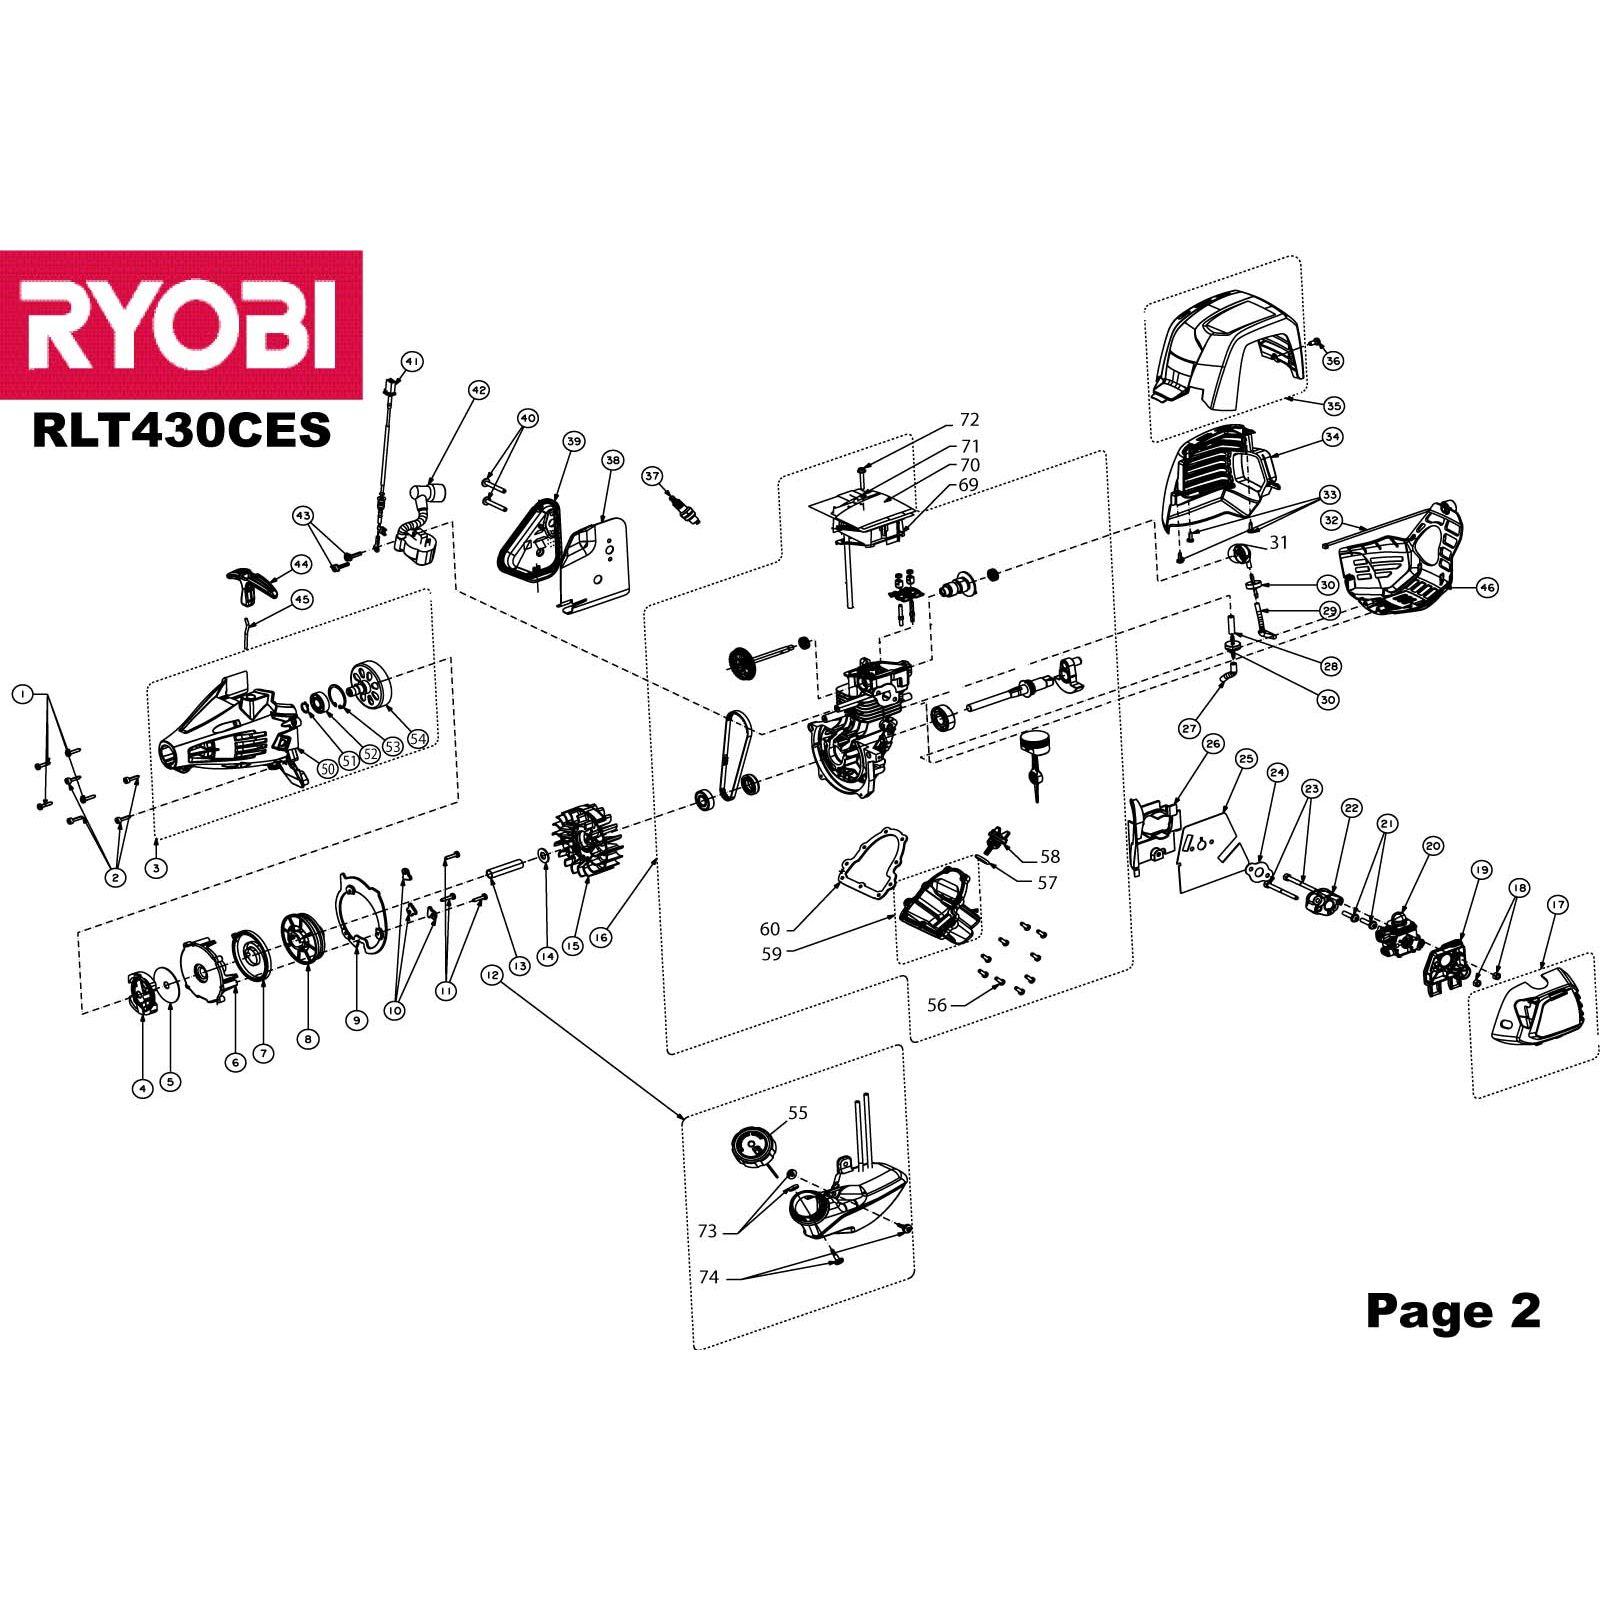 Ryobi RLT430CES PULLEY 5131001734 Spare Part